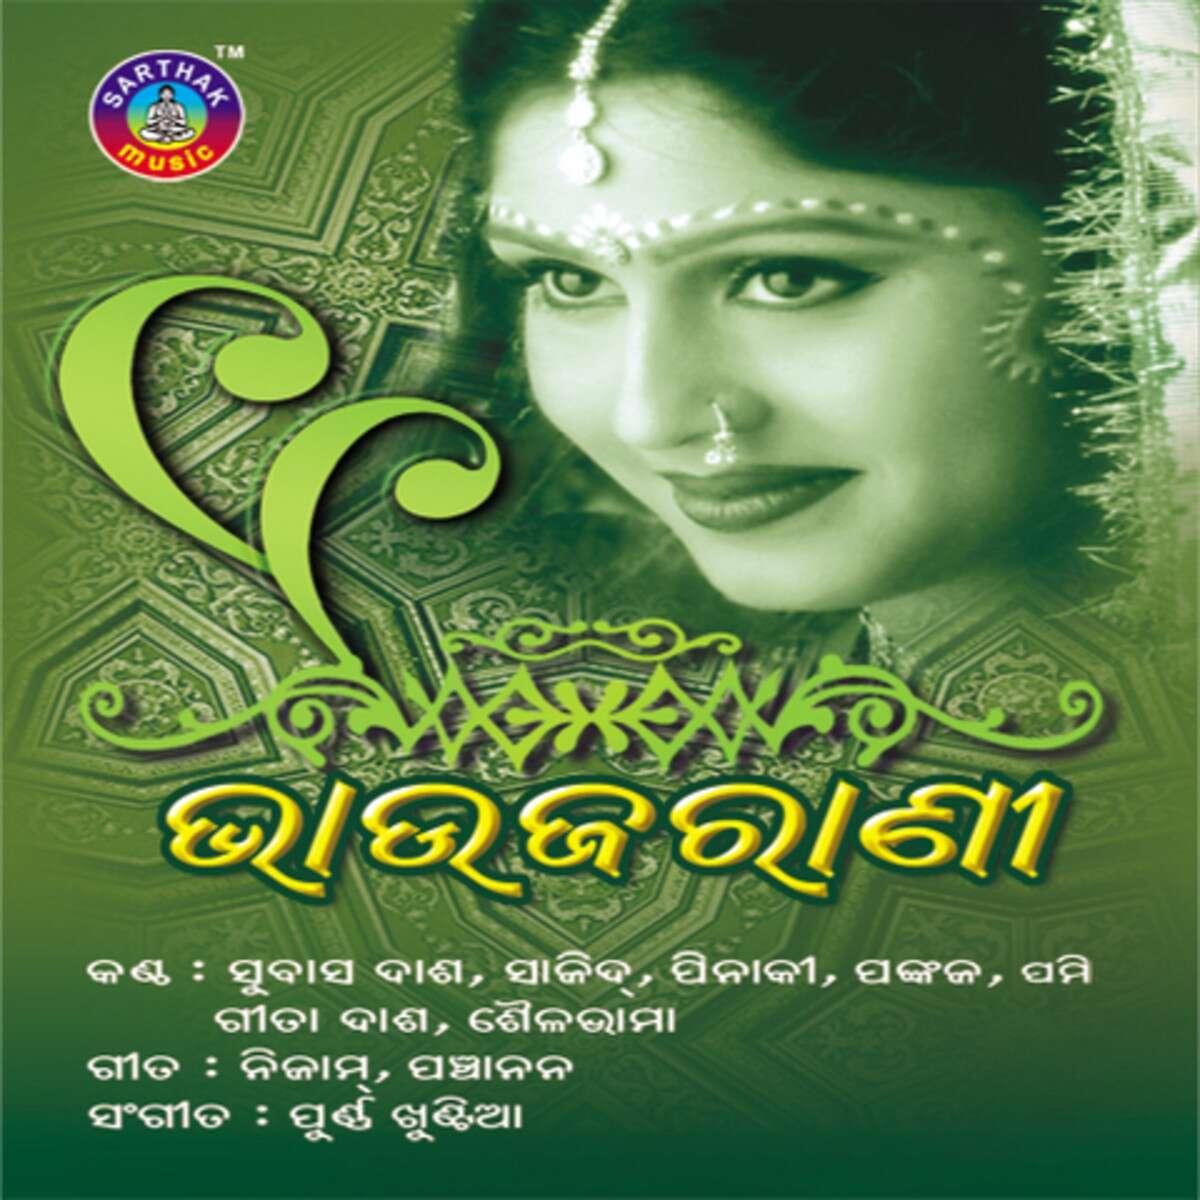 Gan Hela Dura (Subash Das)